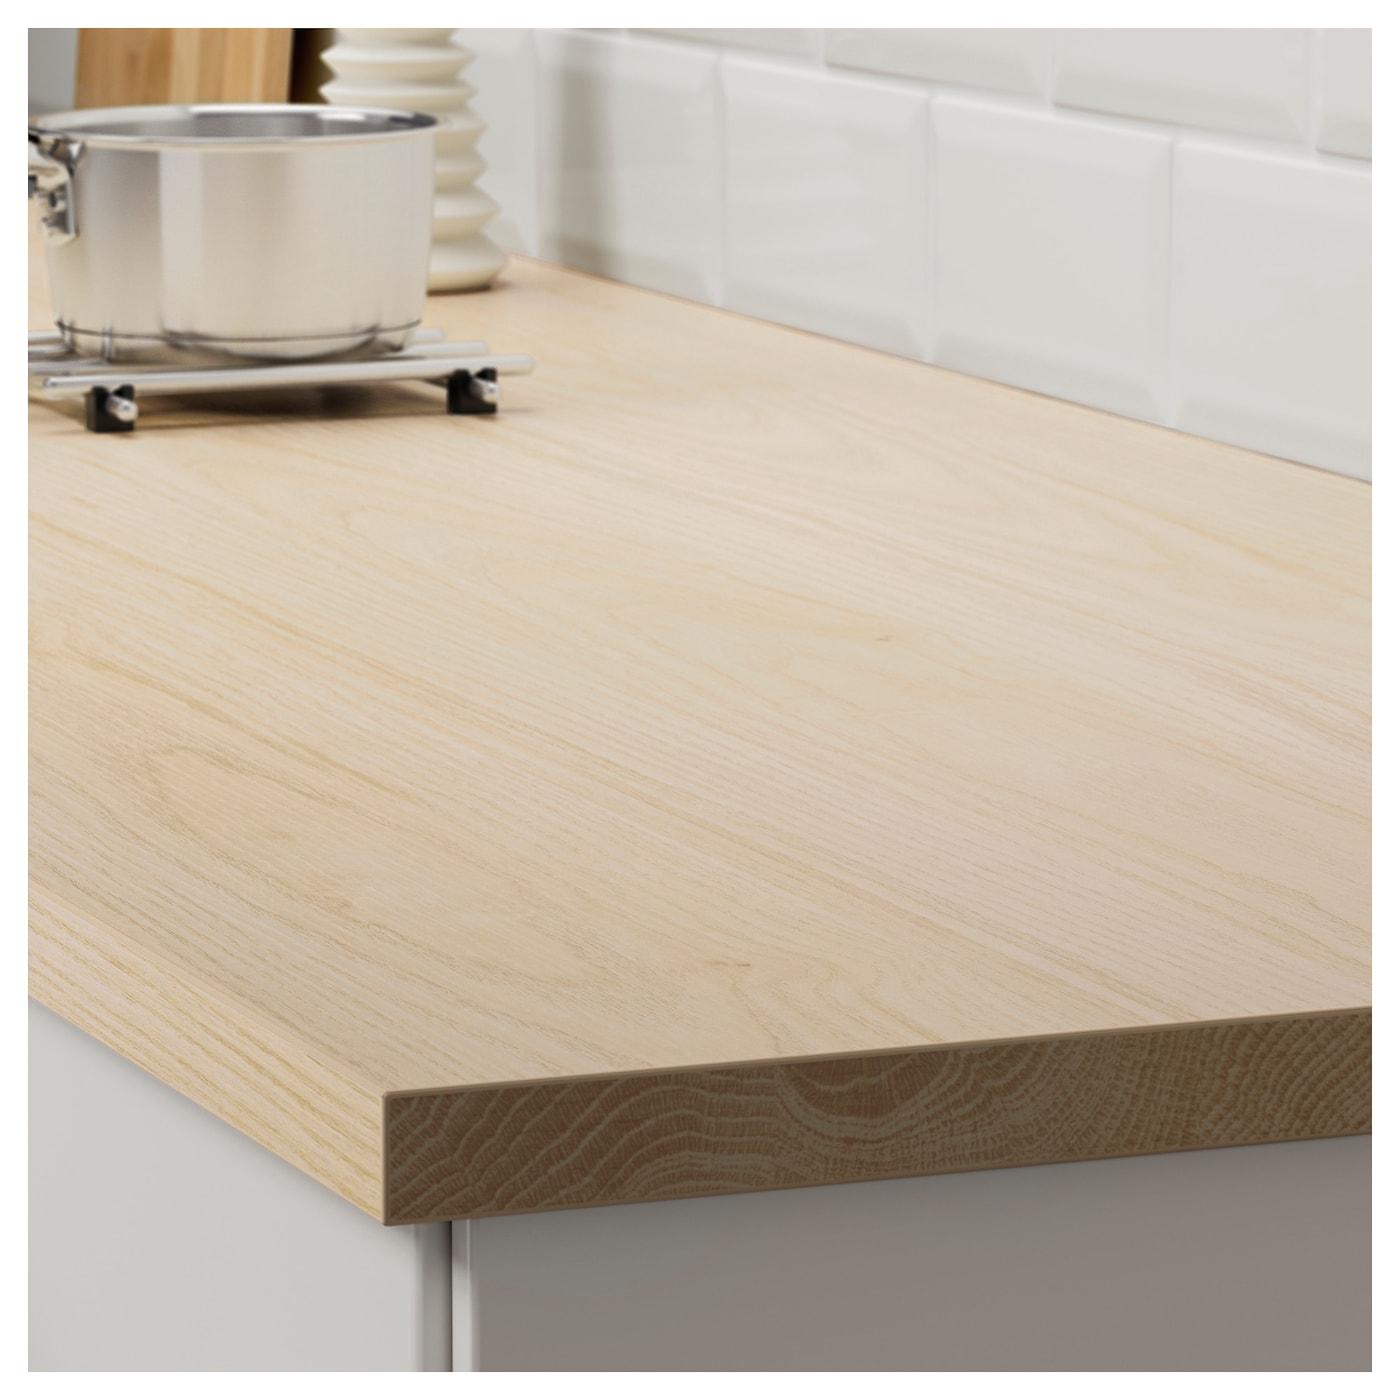 ekbacken plan de travail d cor fr ne 246 x 2 8 cm ikea. Black Bedroom Furniture Sets. Home Design Ideas